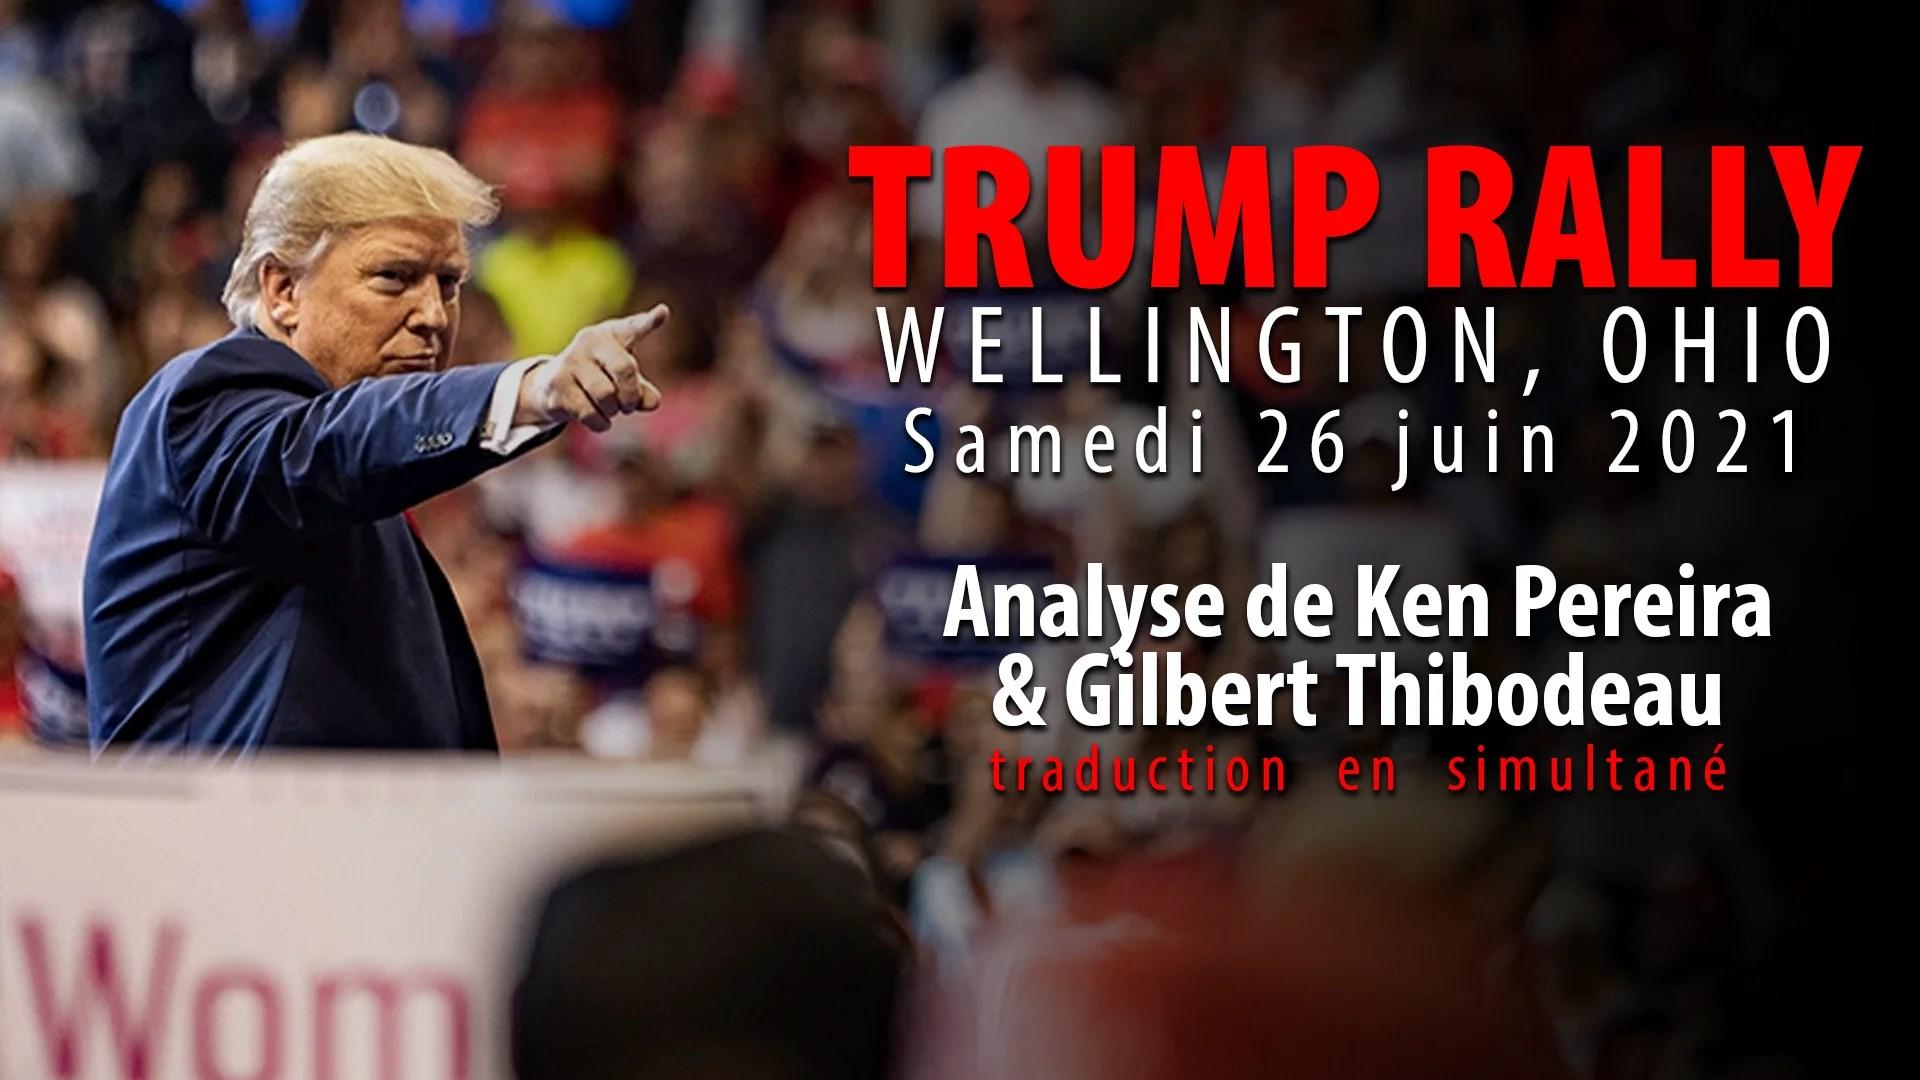 TRUMP RALLY WELLINGTON, OH 26 JUIN 2021 – TRADUCTION FRANÇAISE EN SIMULTANÉ